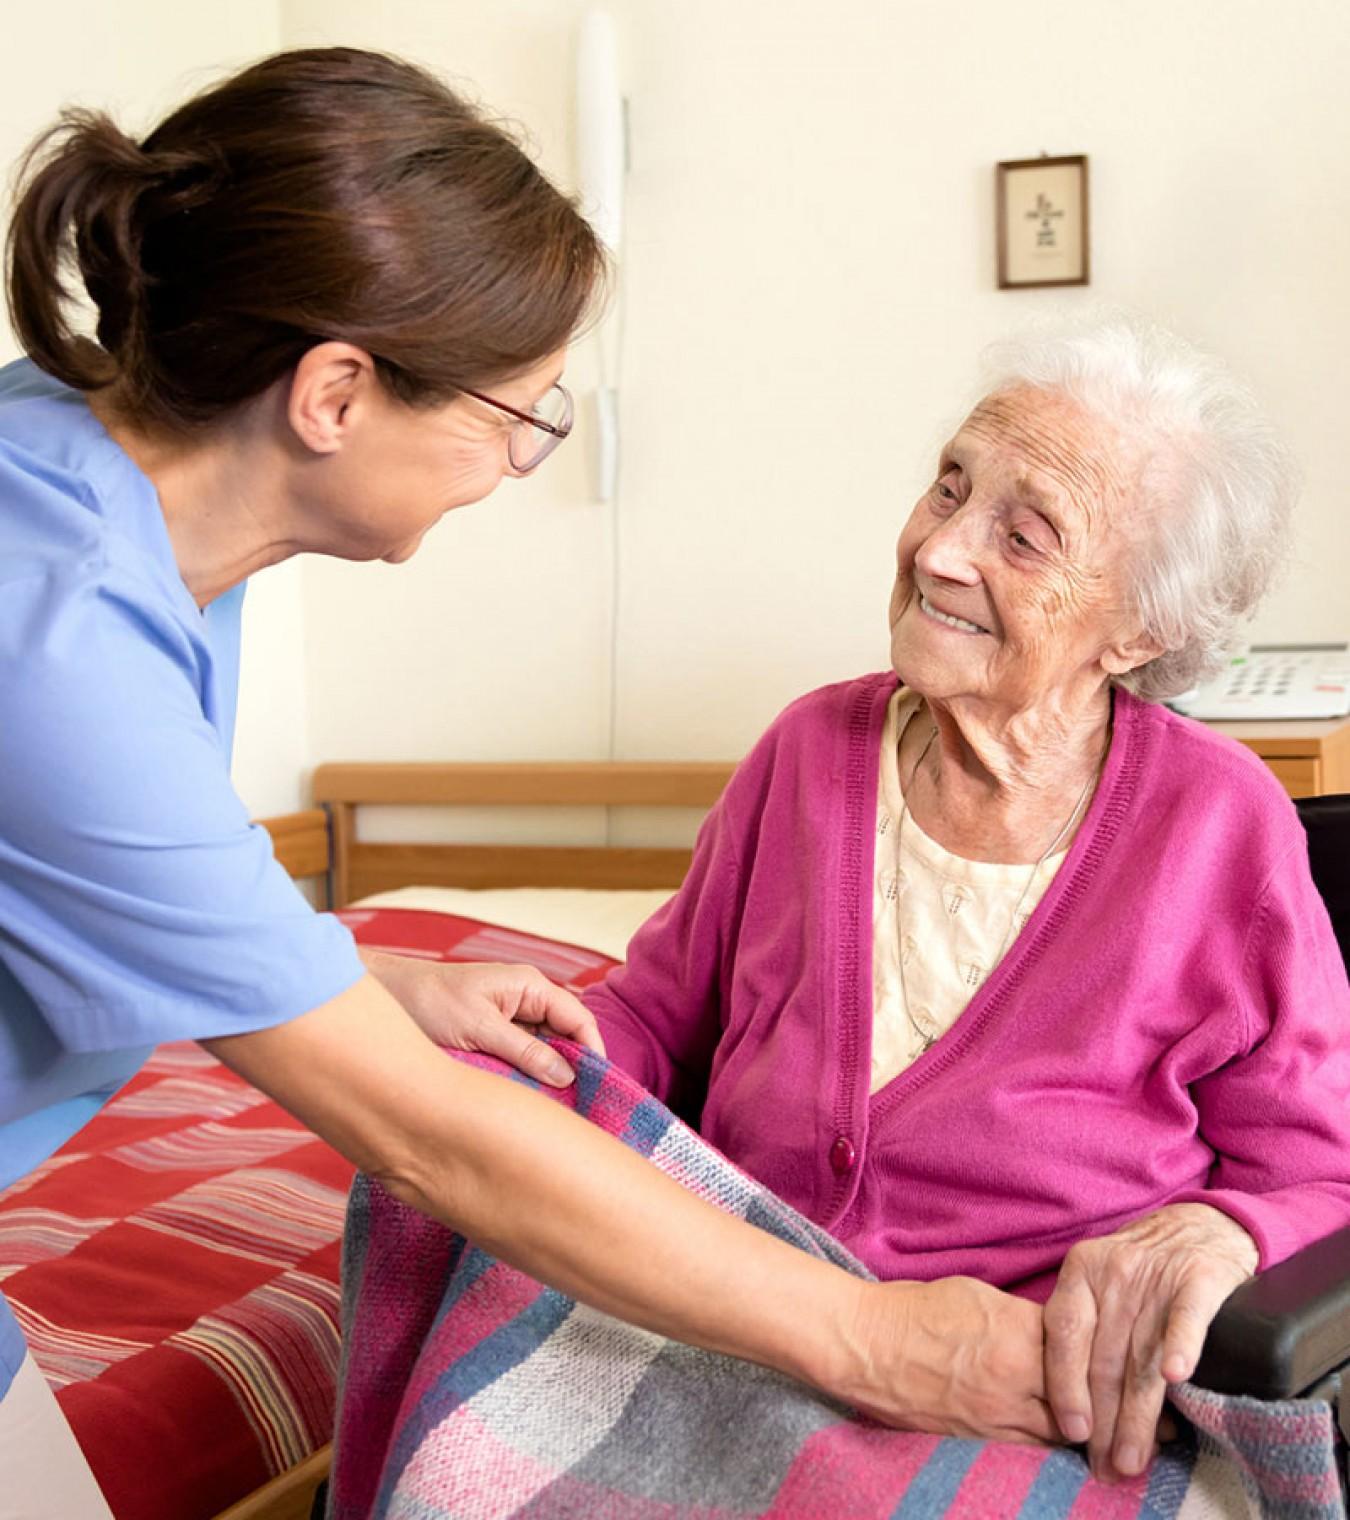 Adult Care Worker Intermediate Level 2 - testimonial